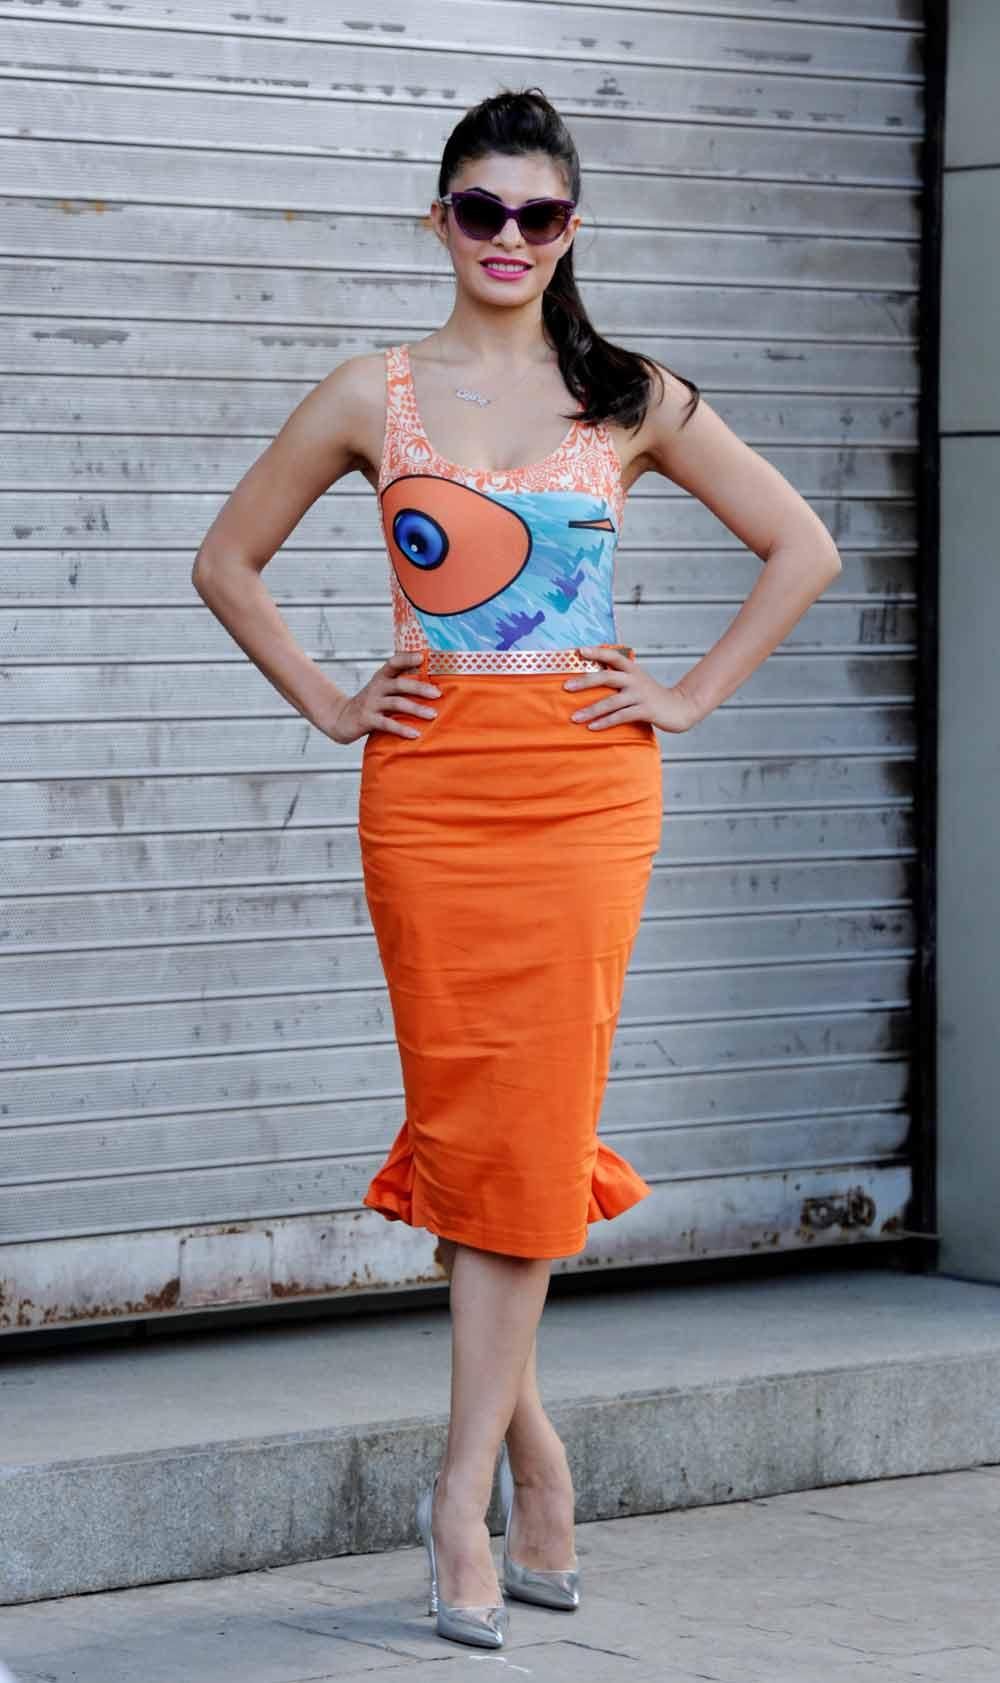 Jacqueline Fernandez wore it just right